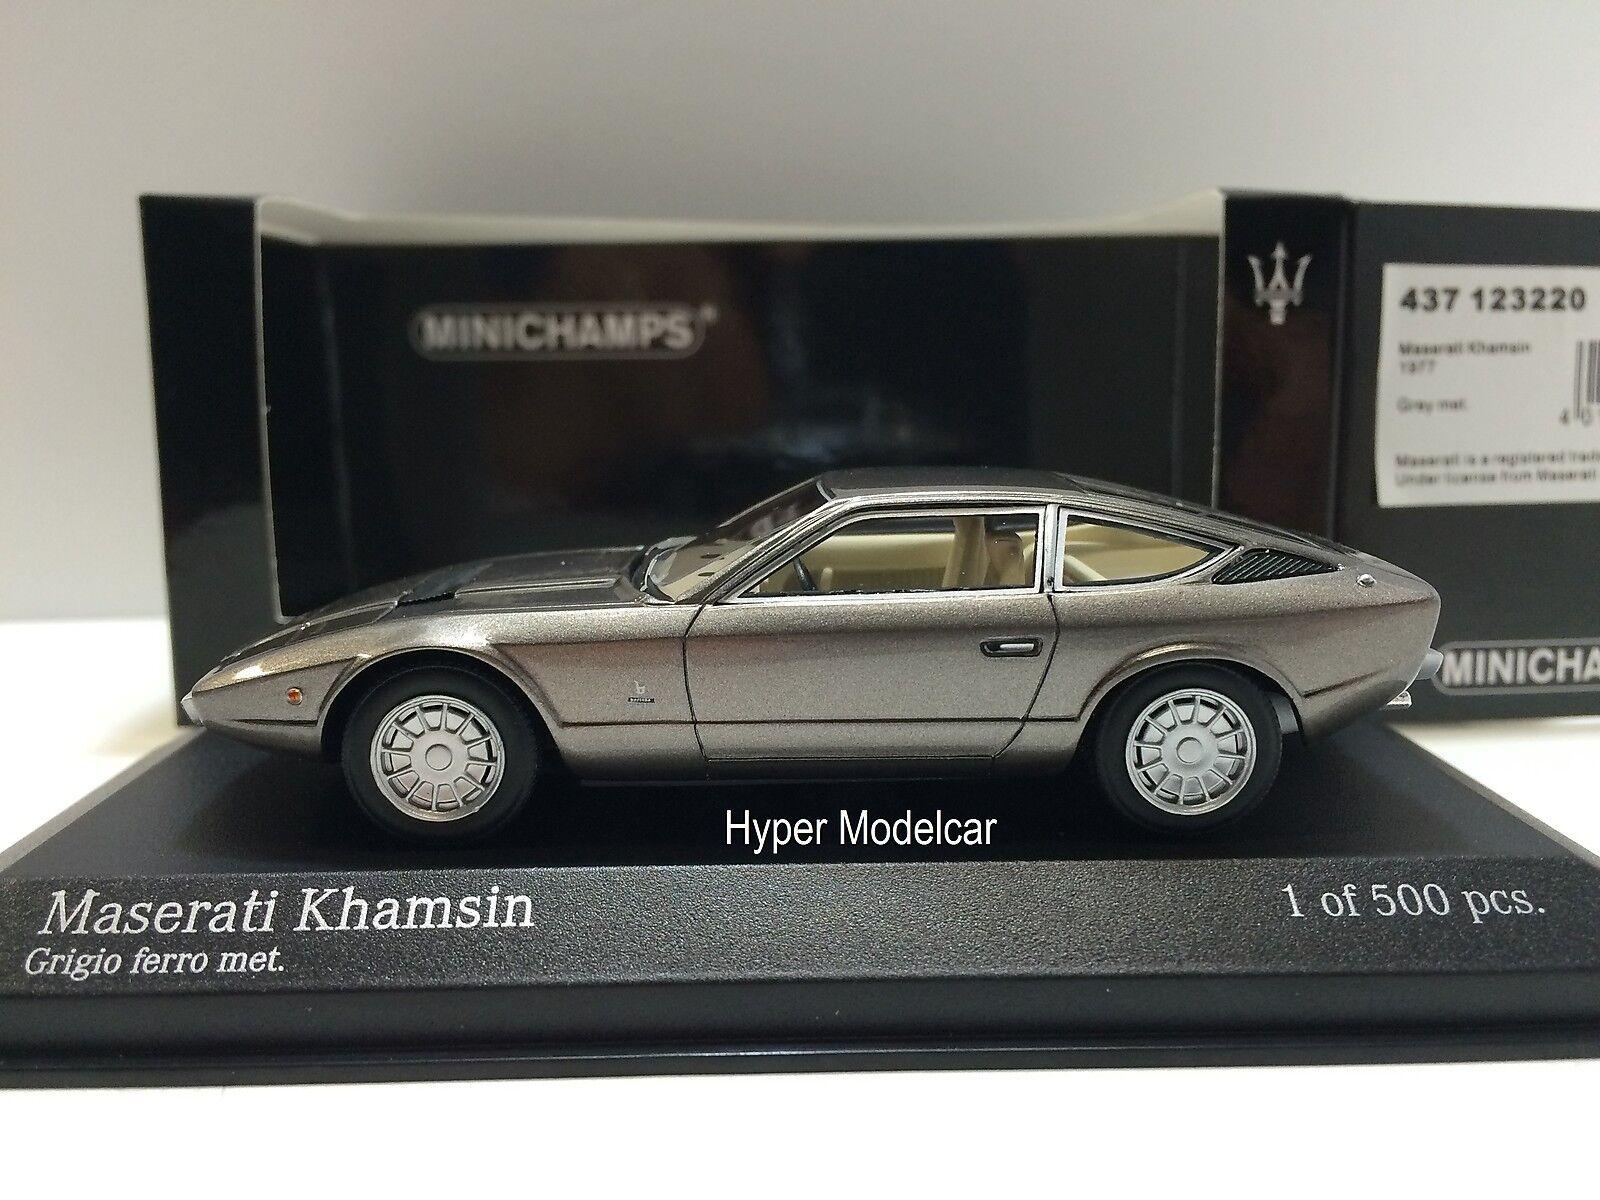 MINICHAMPS 1 43 Maserati Khamsin 1977 Gry Met. Art. 437123220